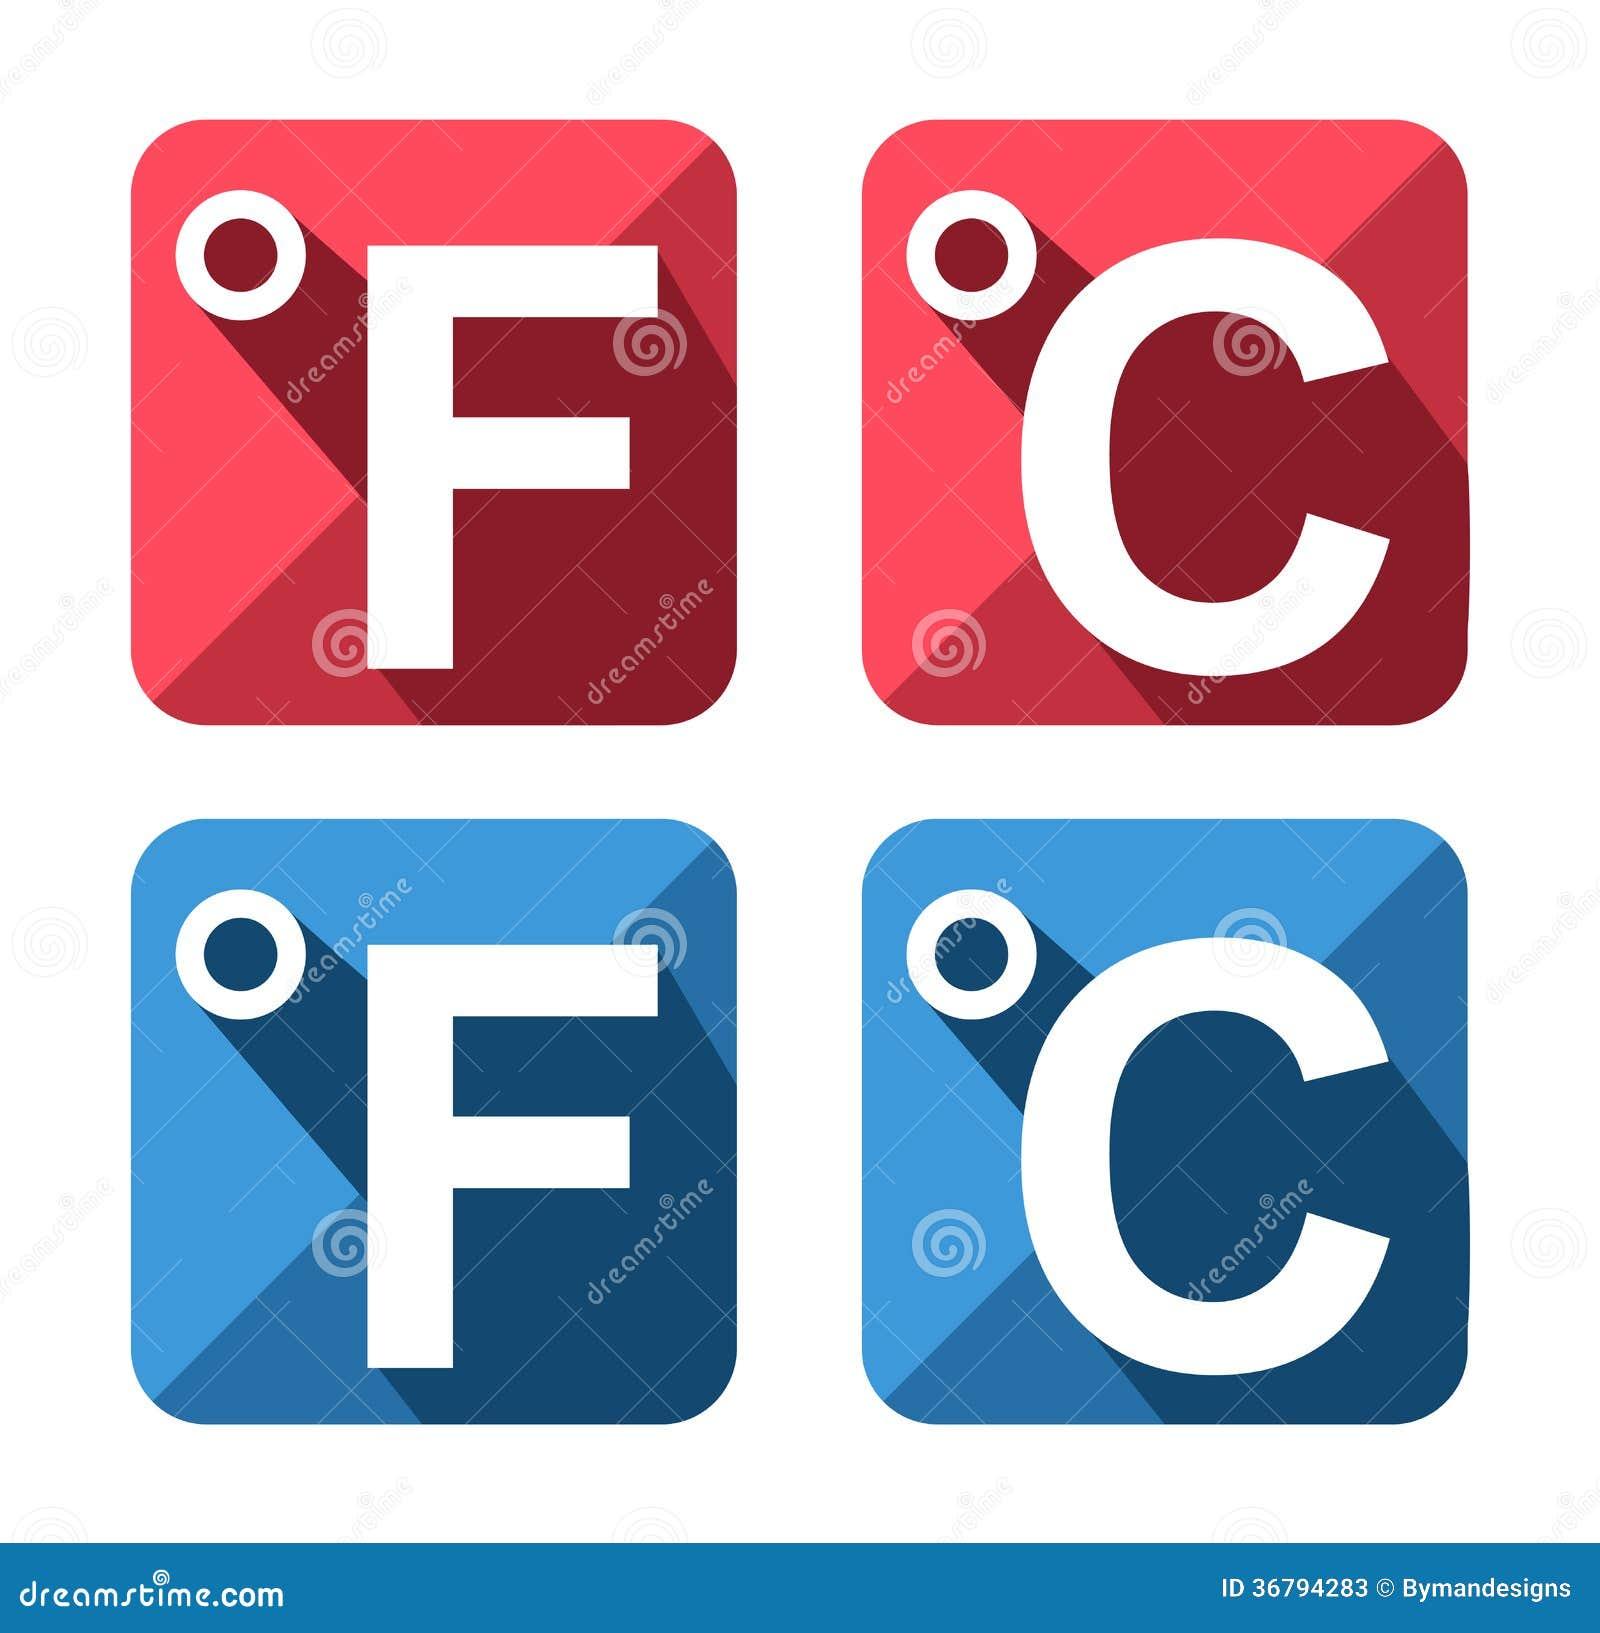 Celsius and fahrenheit symbol icon set stock vector illustration celsius and fahrenheit symbol icon set biocorpaavc Choice Image